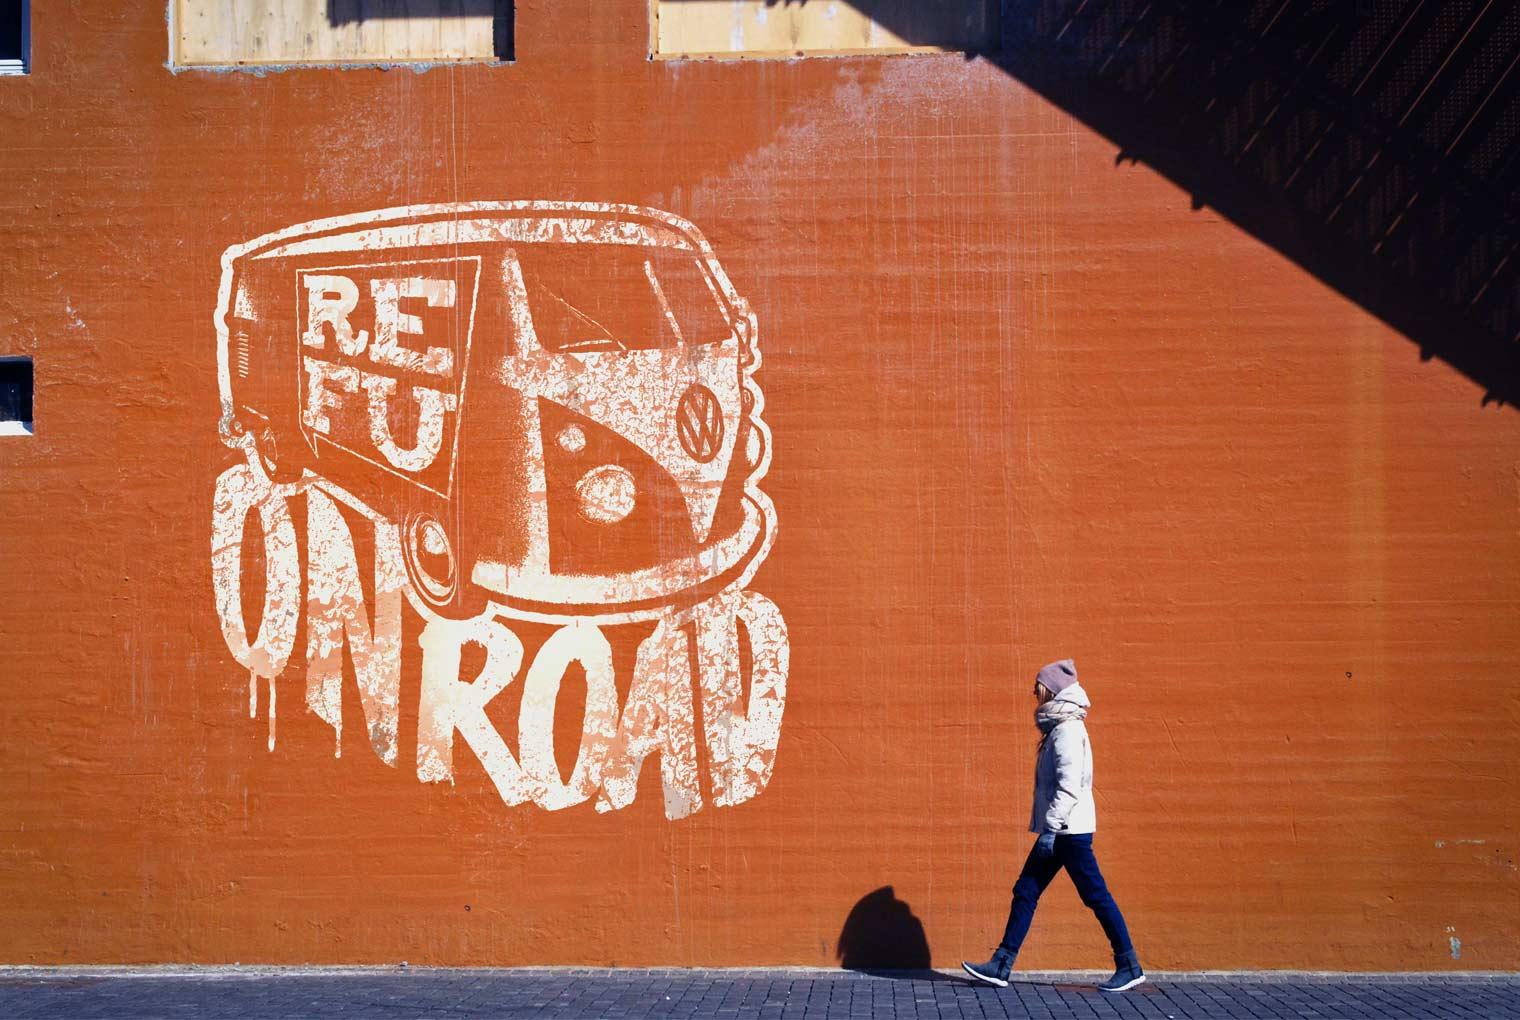 Logotipo-Refu-On-Road